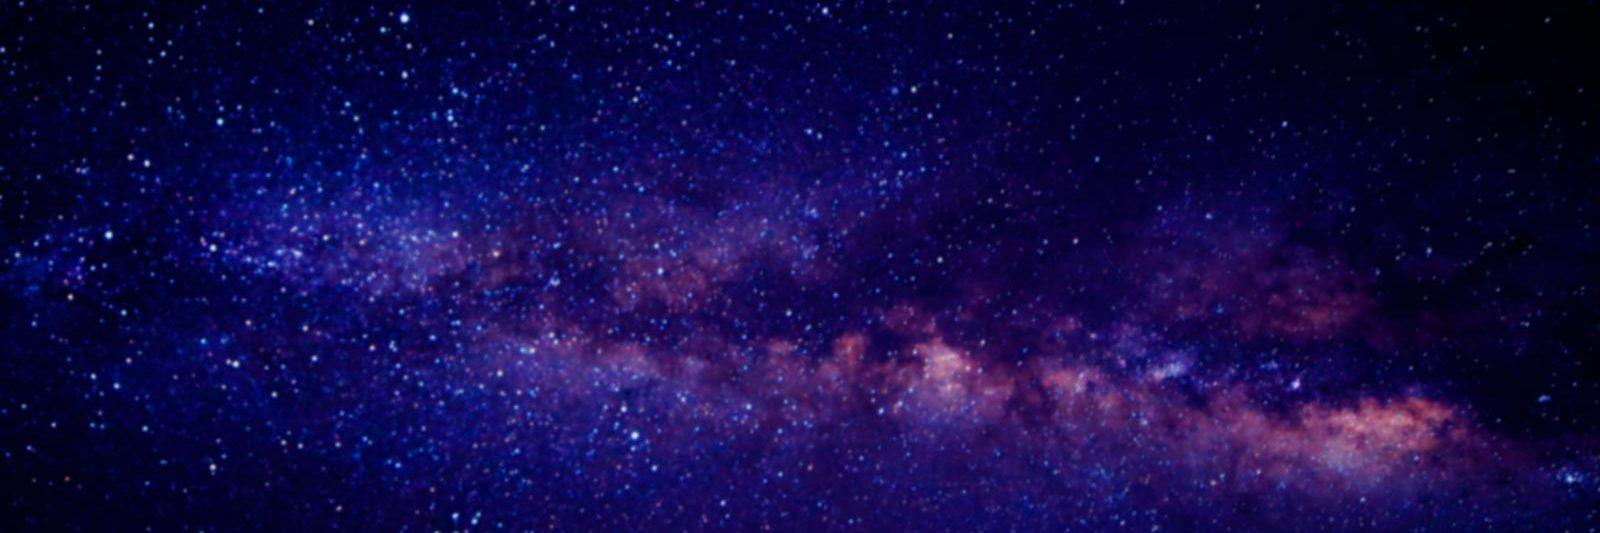 horoscopo gratis - fondo